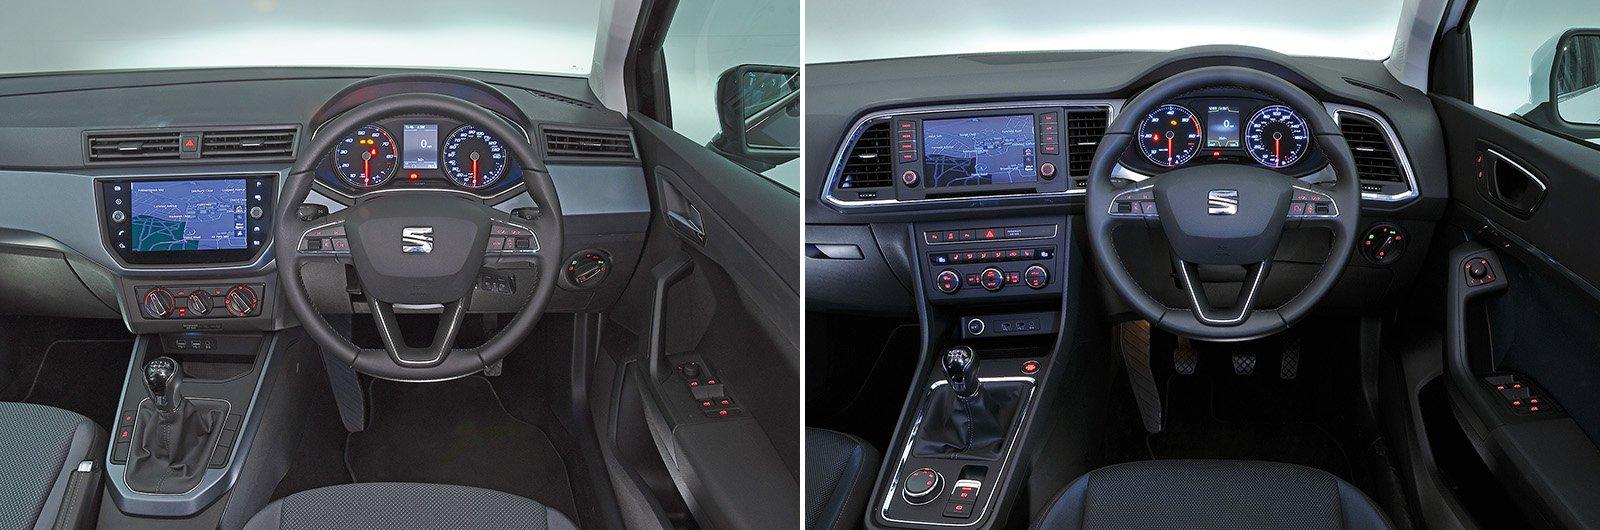 New Seat Arona vs used Seat Ateca